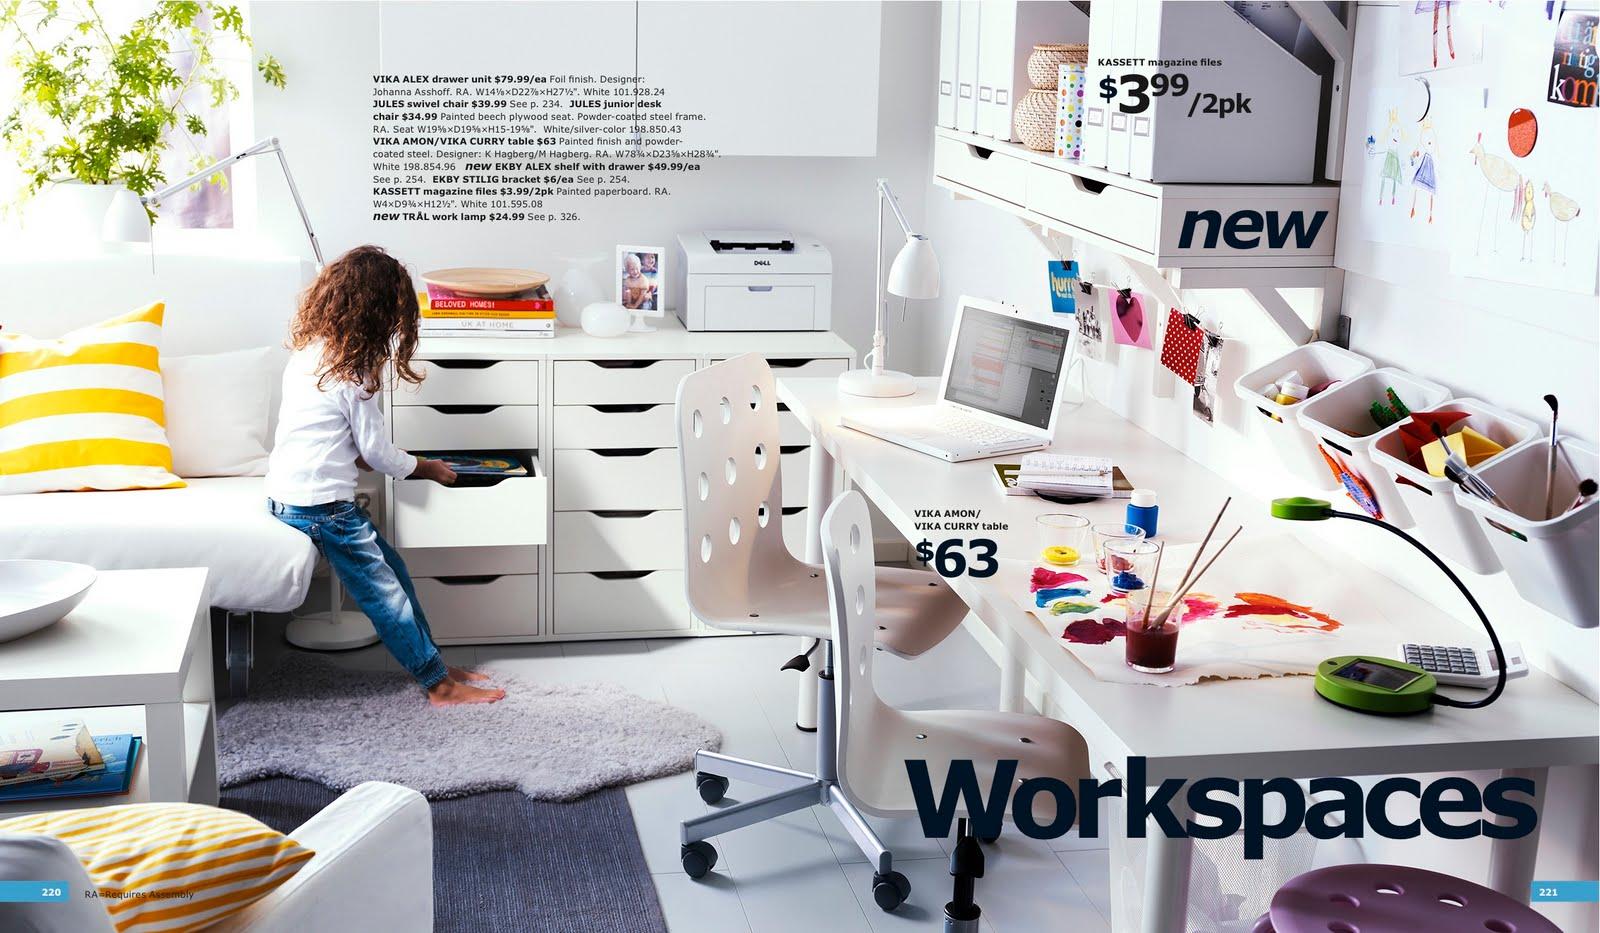 katalog ikea 2011 z potrzeby pi kna. Black Bedroom Furniture Sets. Home Design Ideas